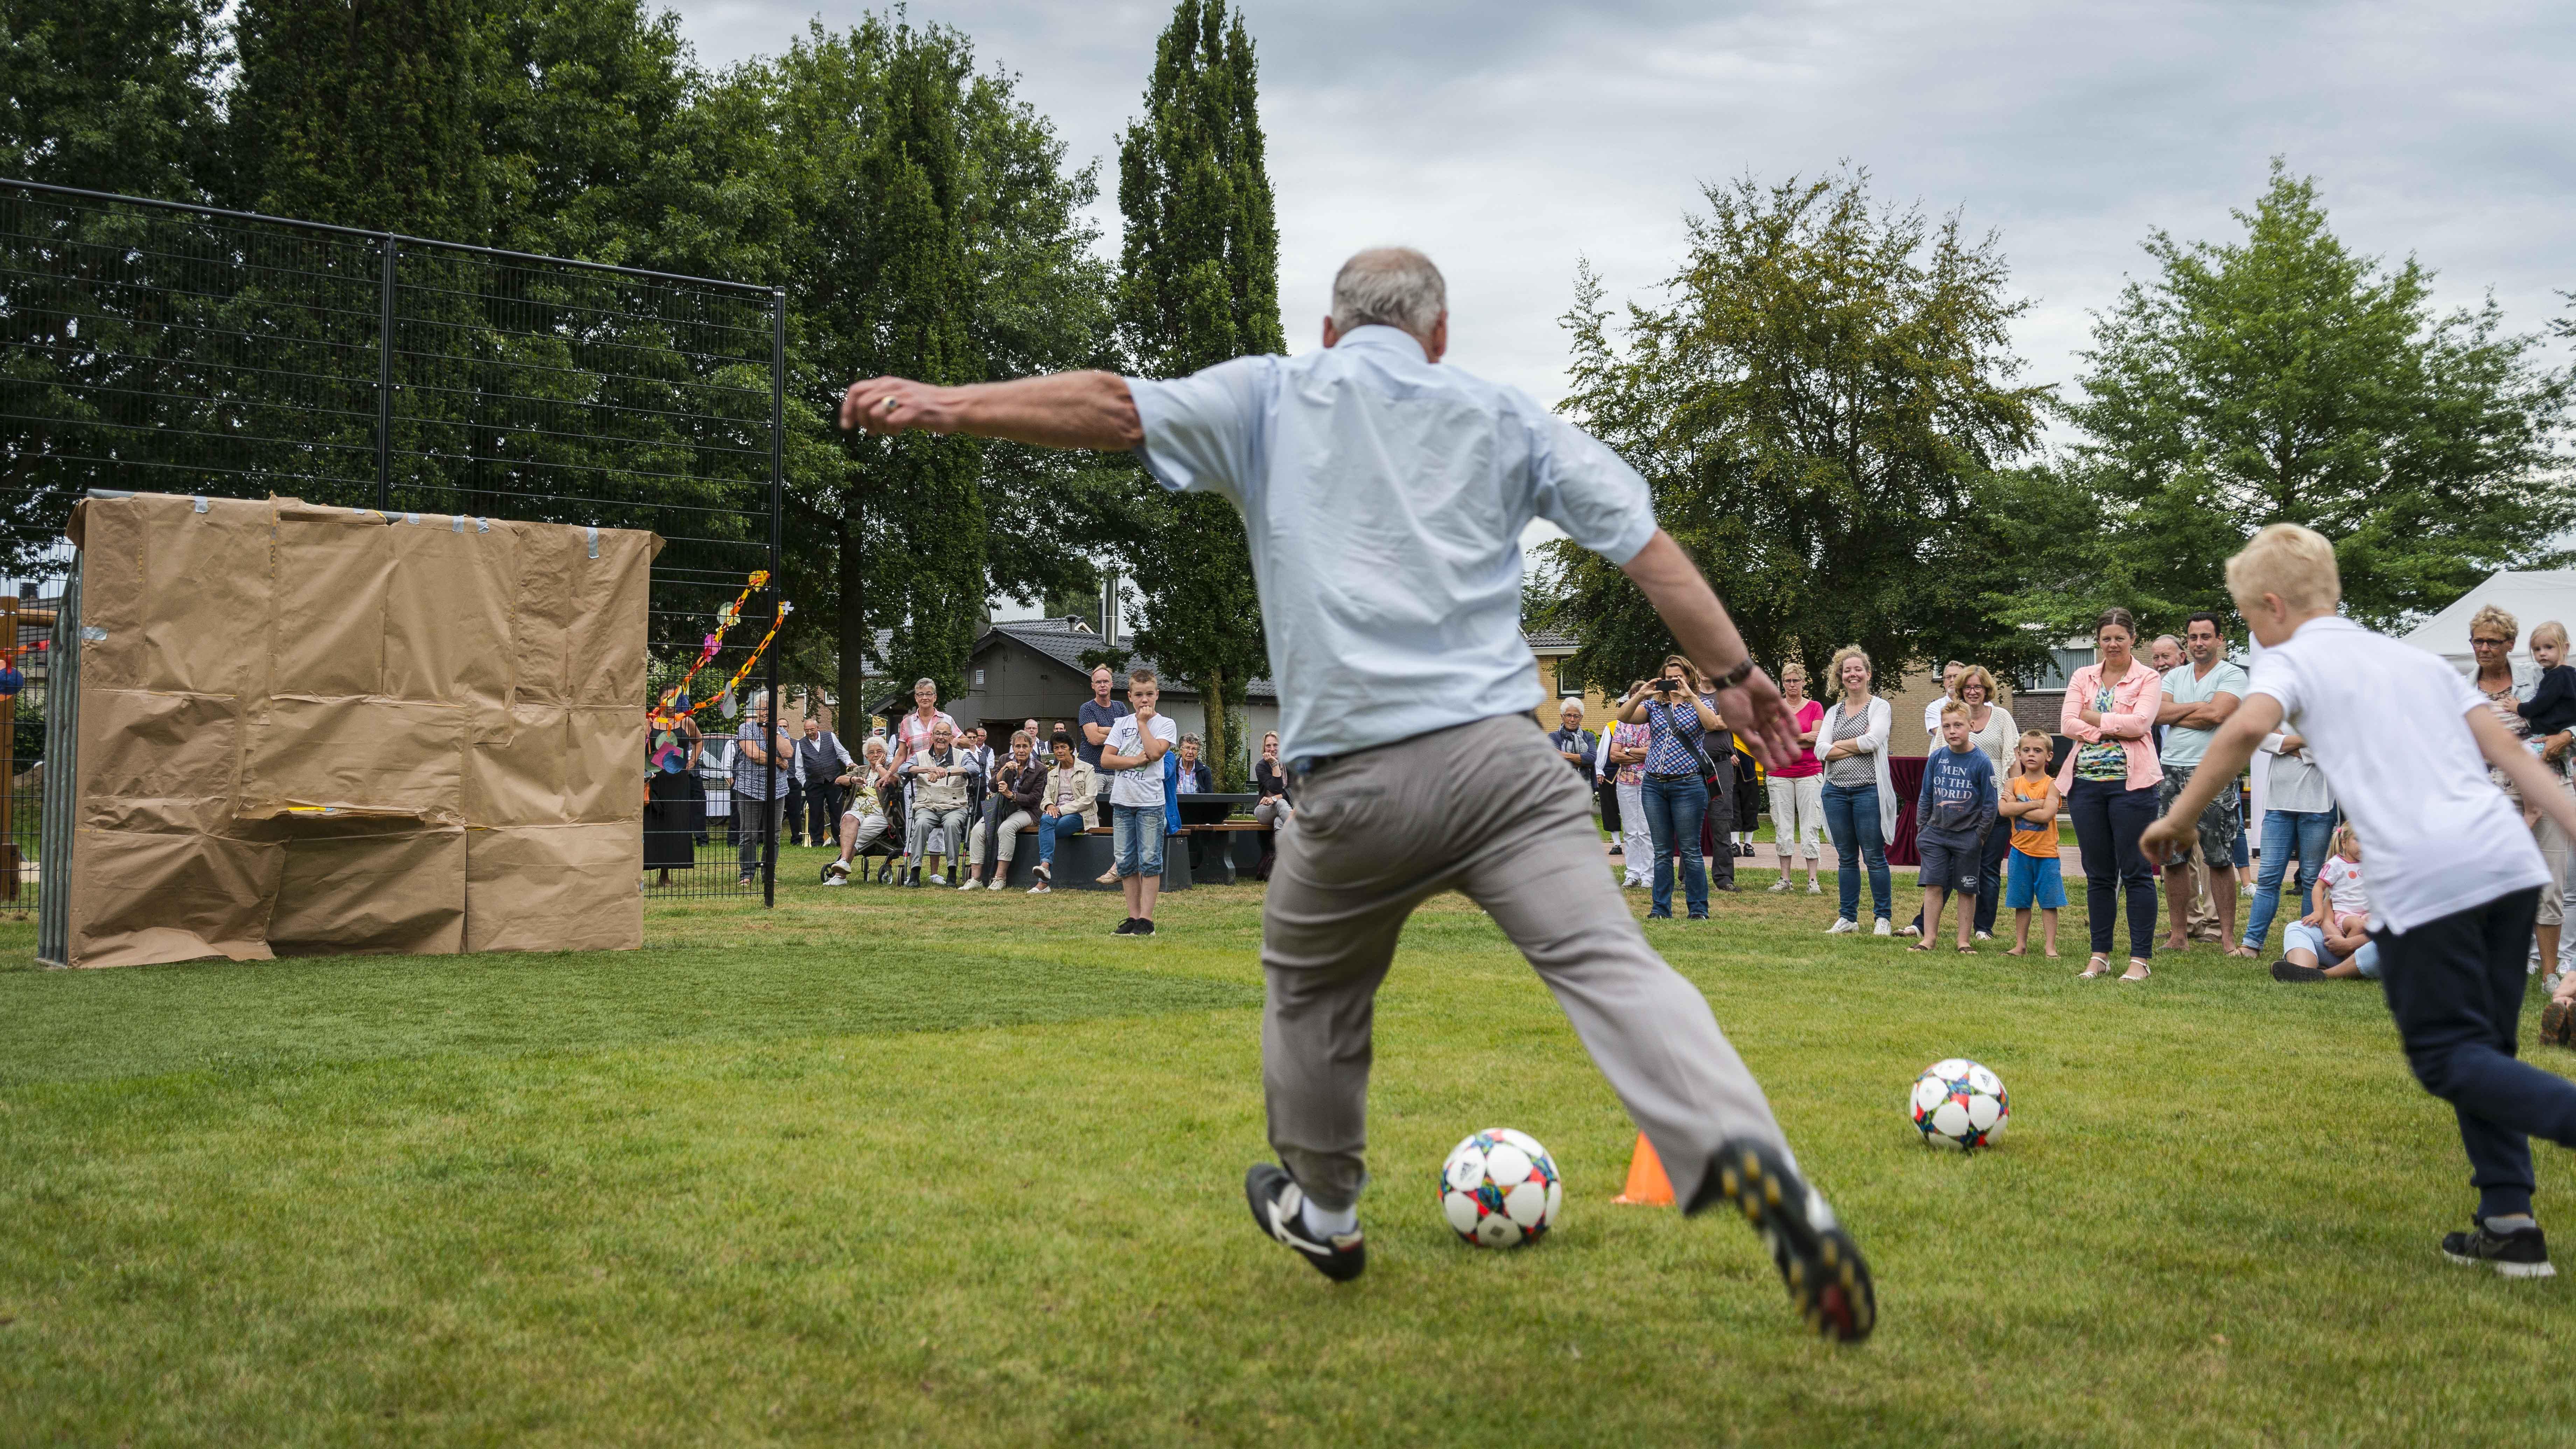 Vernieuwd speelveld in Nederasselt (2-9-2016)